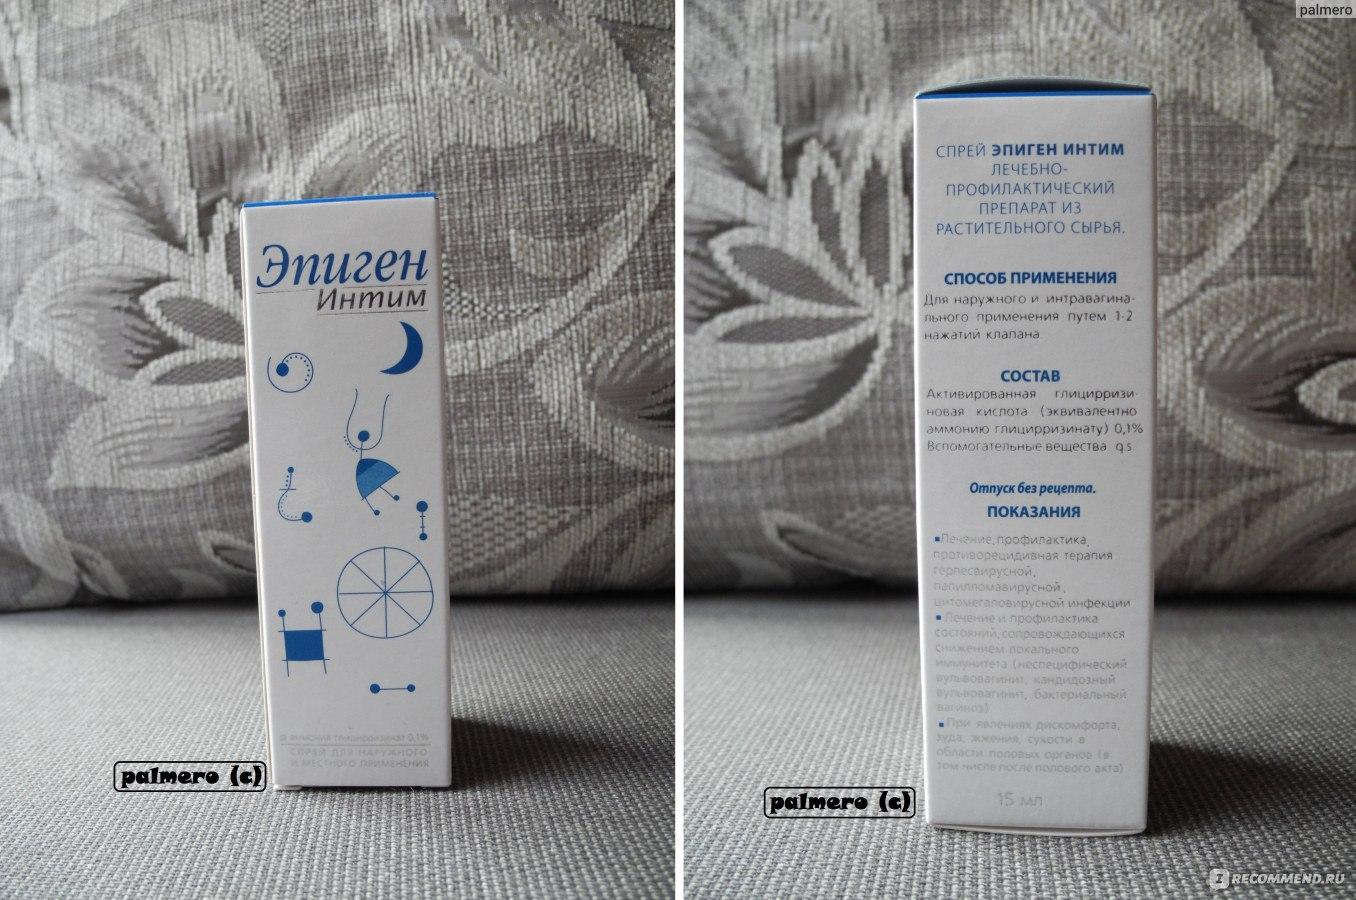 Эпиген спрей отзывы при молочнице